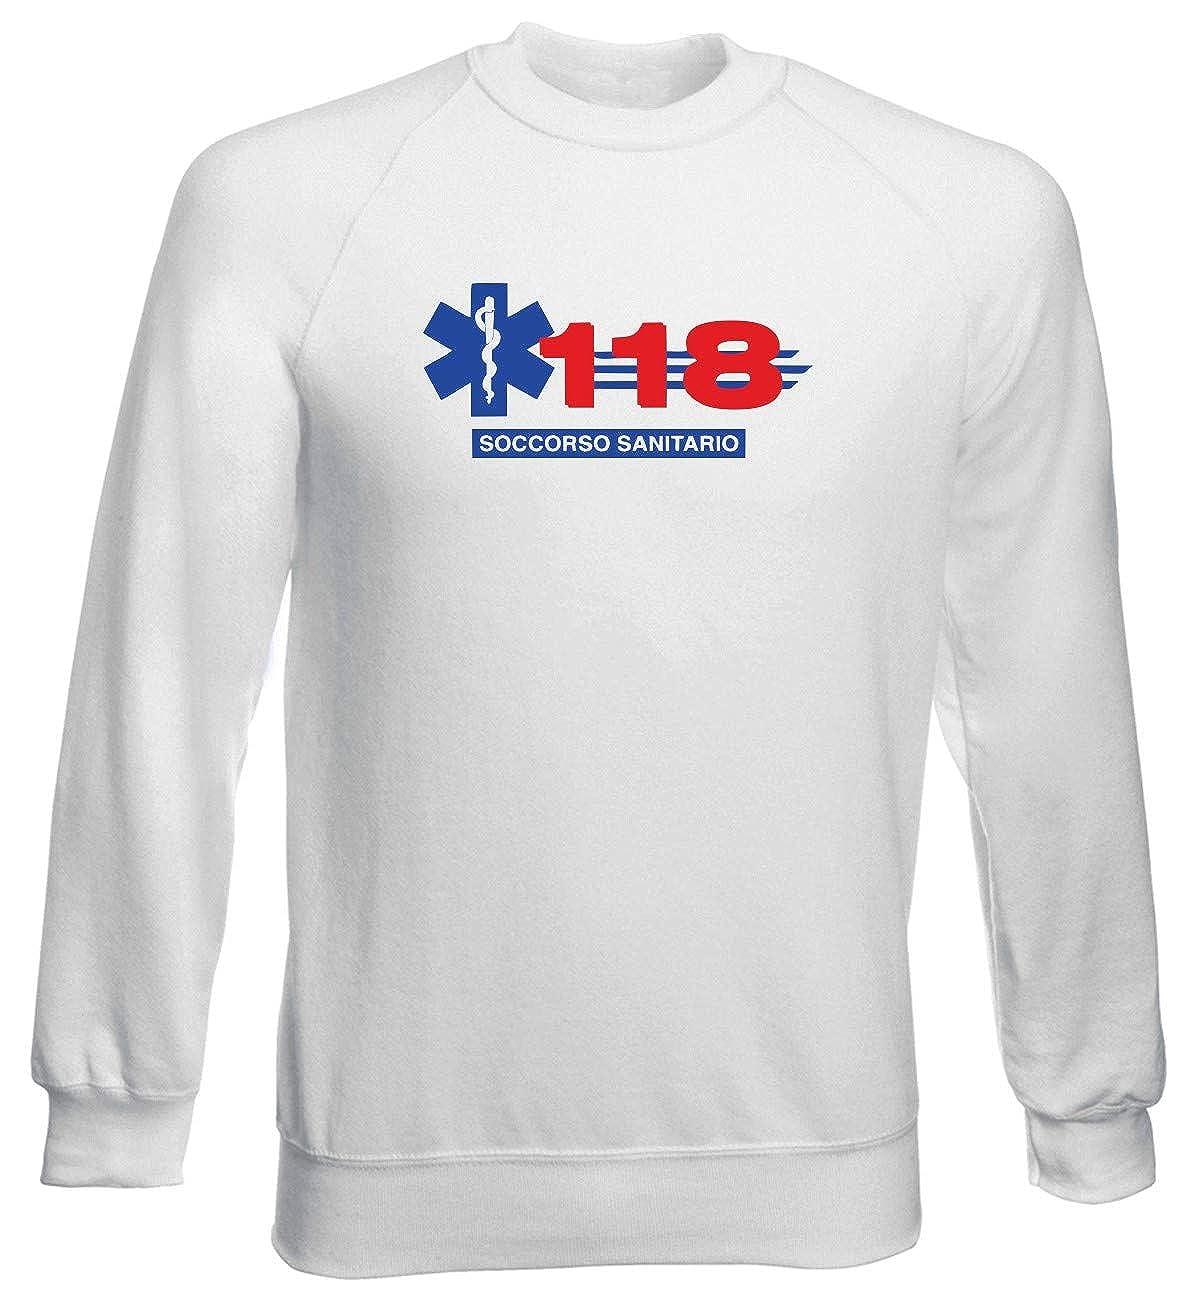 Speed Shirt Felpa Girocollo Uomo Bianca TM0601 118 Soccorso Sanitario